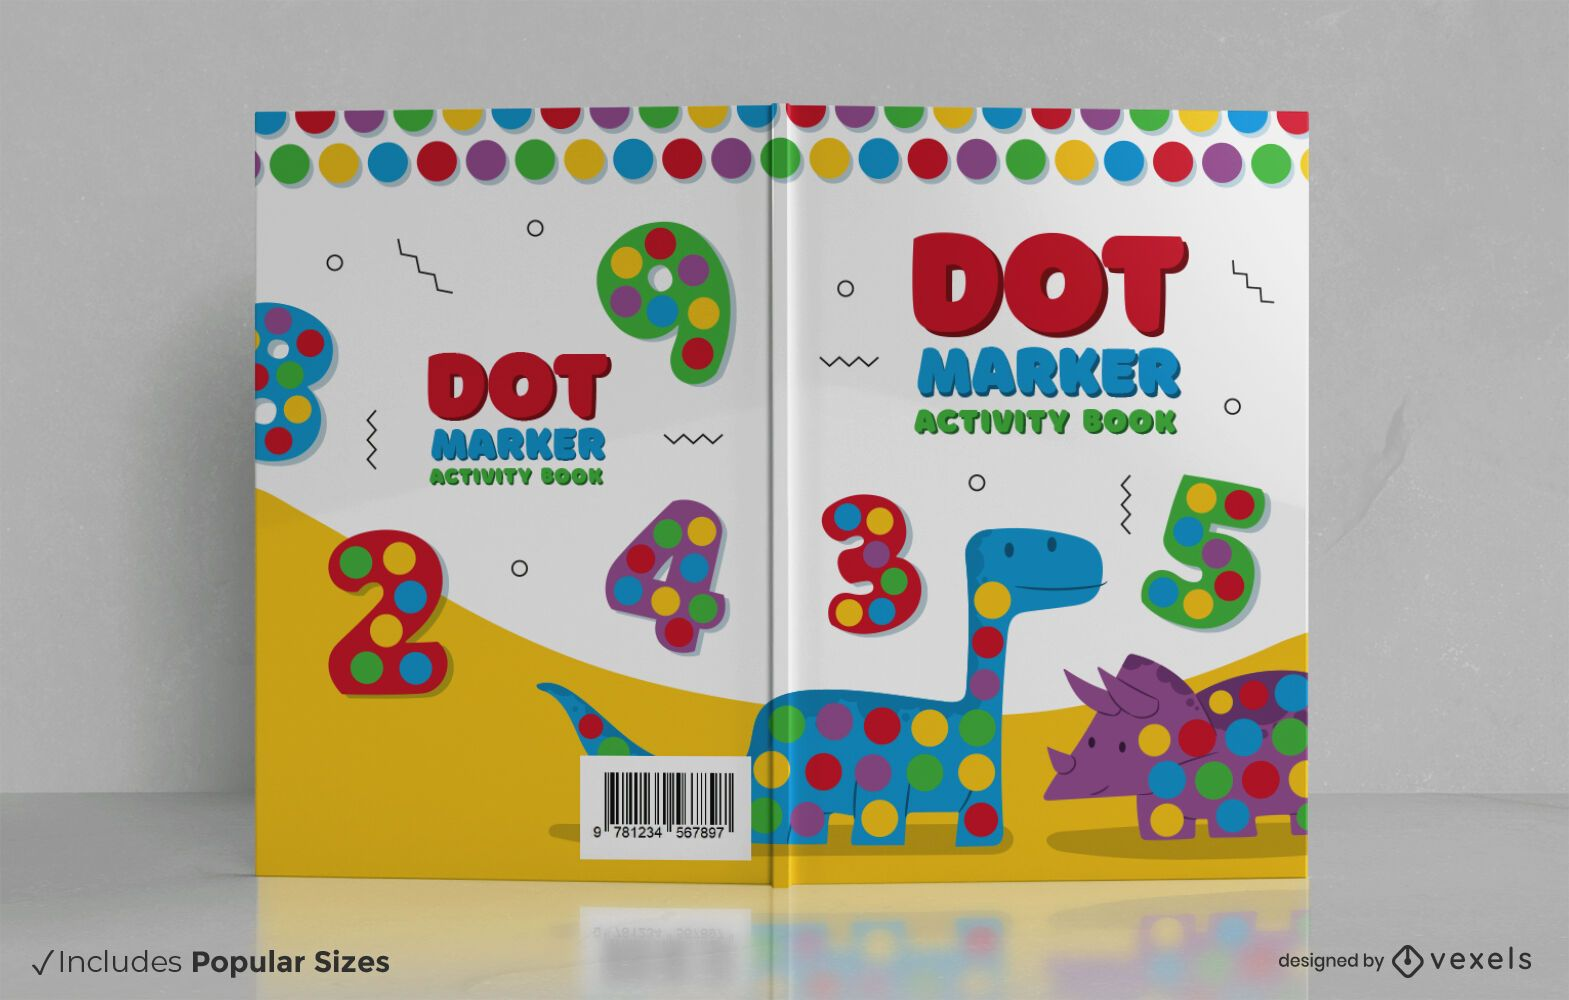 Dot marker activity book cover design